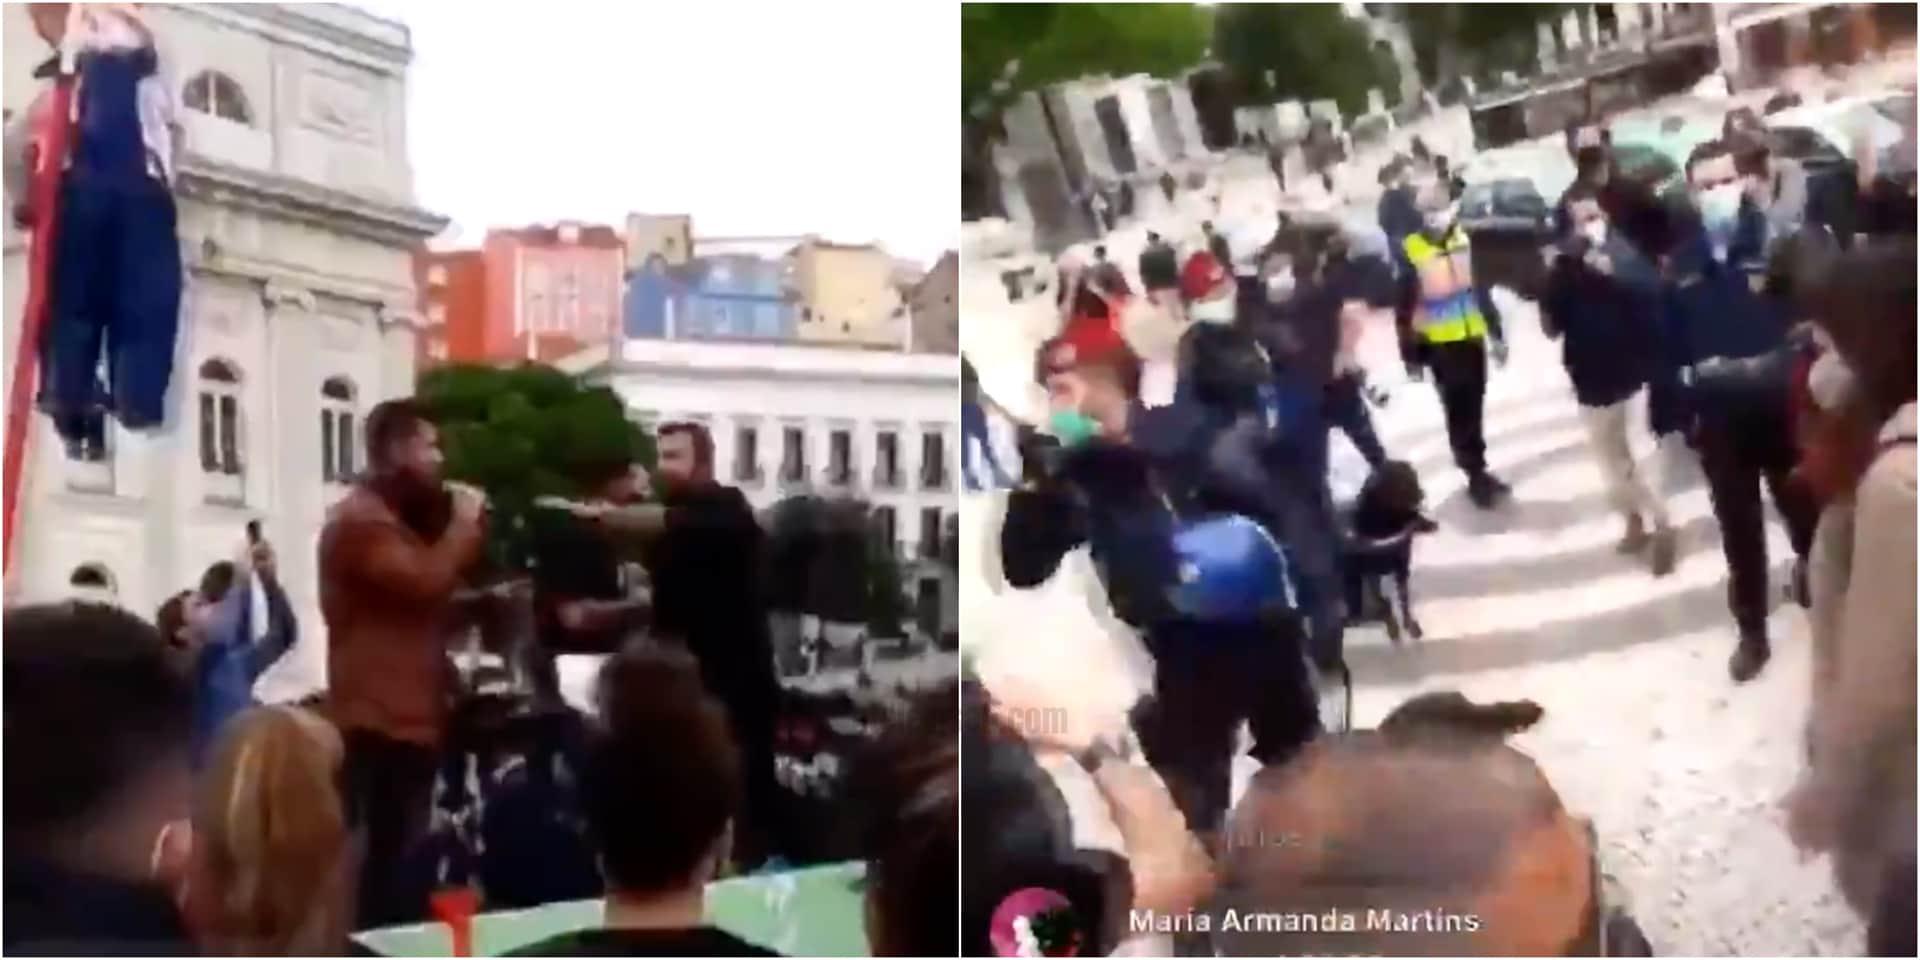 Observador Manifestacao Quase Agredido Ljubomir Stanisic